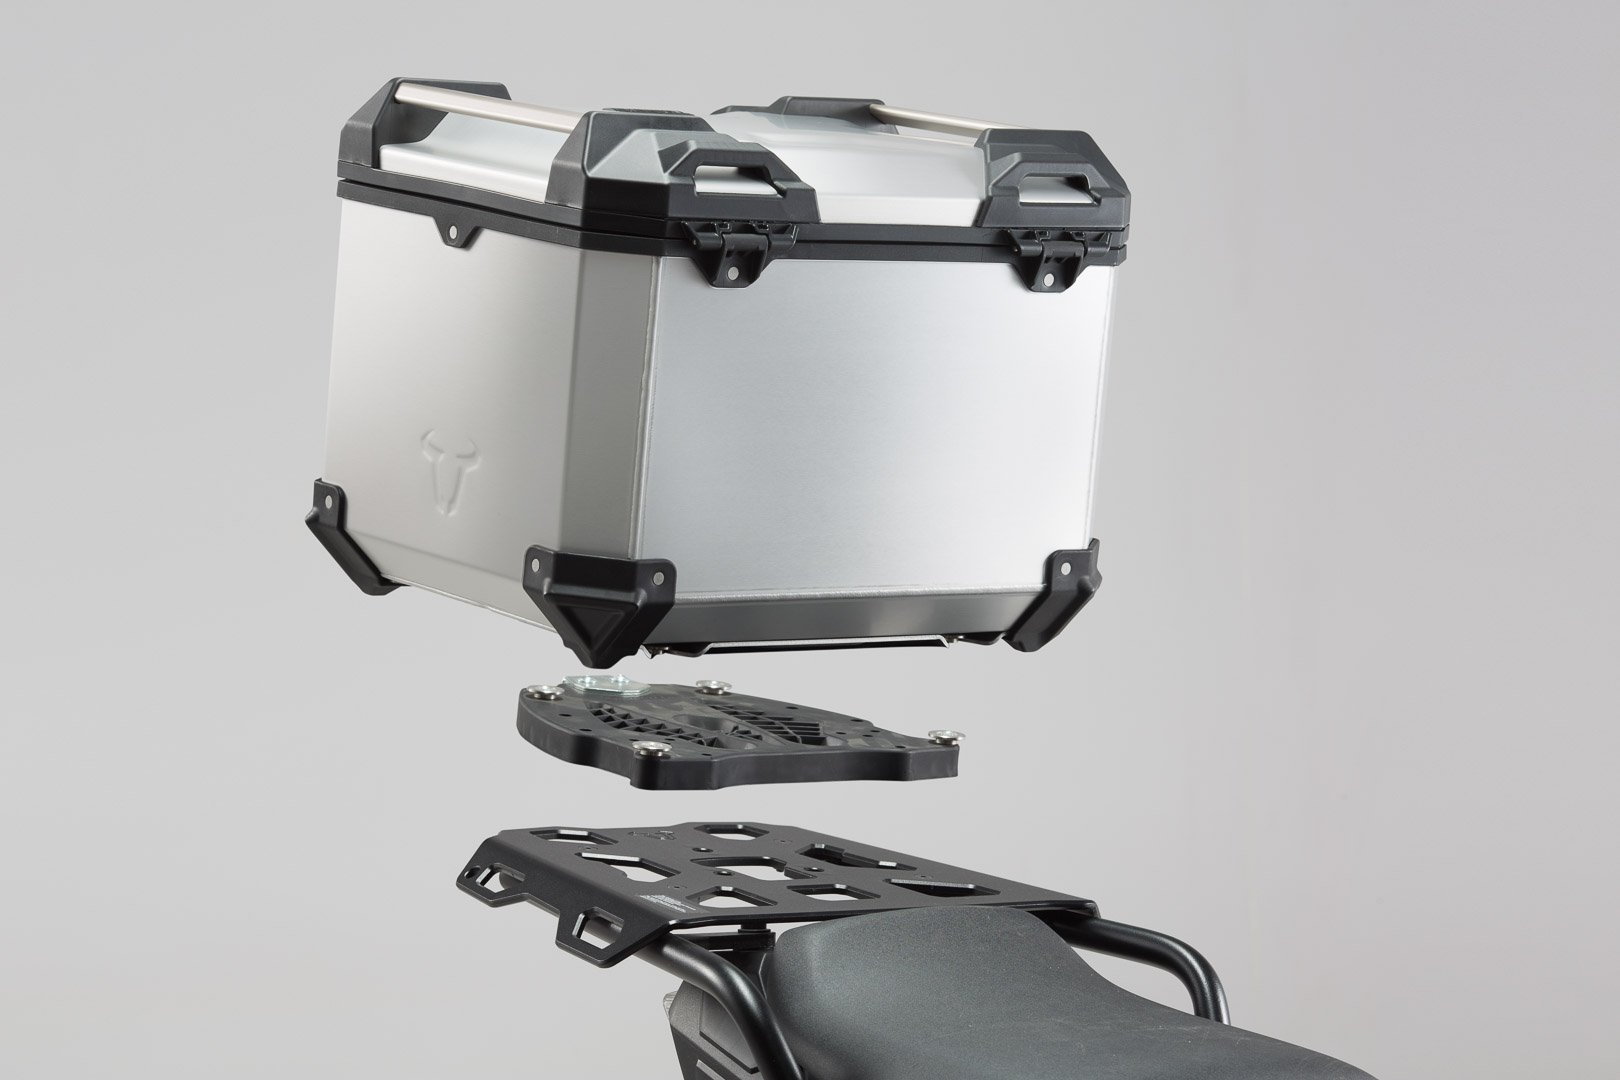 SW-Motech TRAX ADV top case system (silver) Triumph Sprint ST 1050 / Tiger 1050 SE